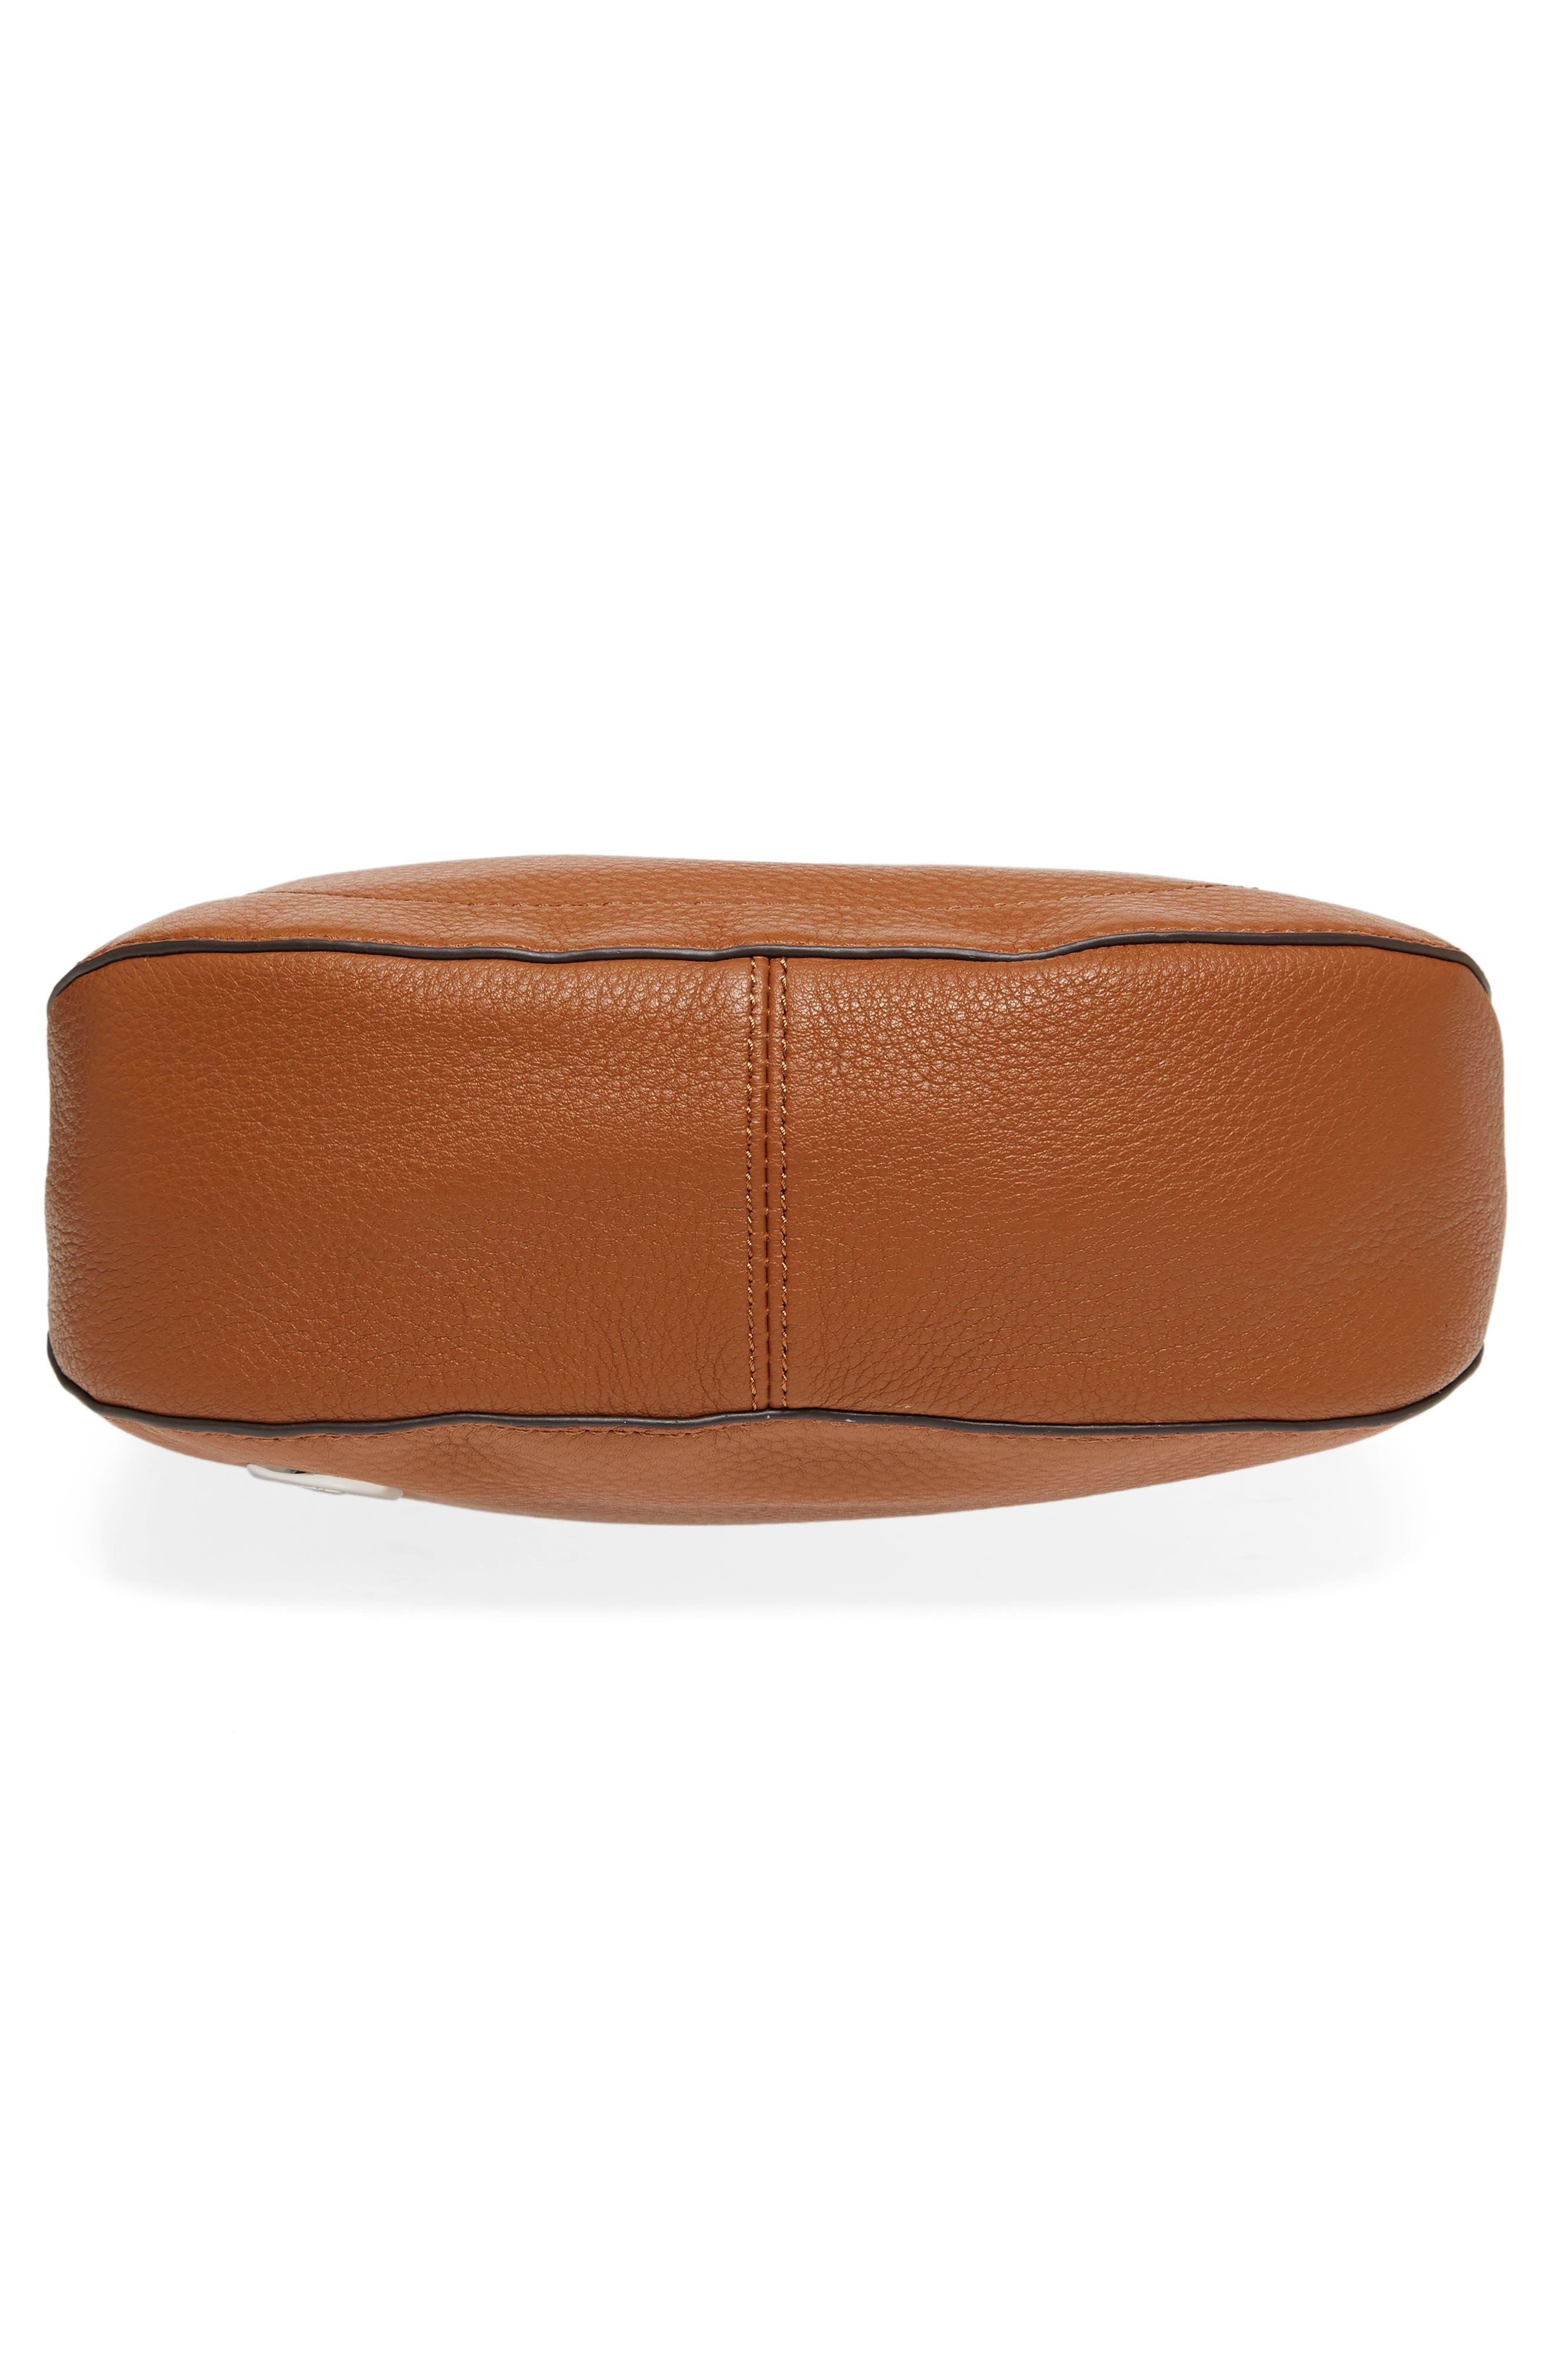 'Tala' Leather Crossbody Bag,                             Alternate thumbnail 6, color,                             203